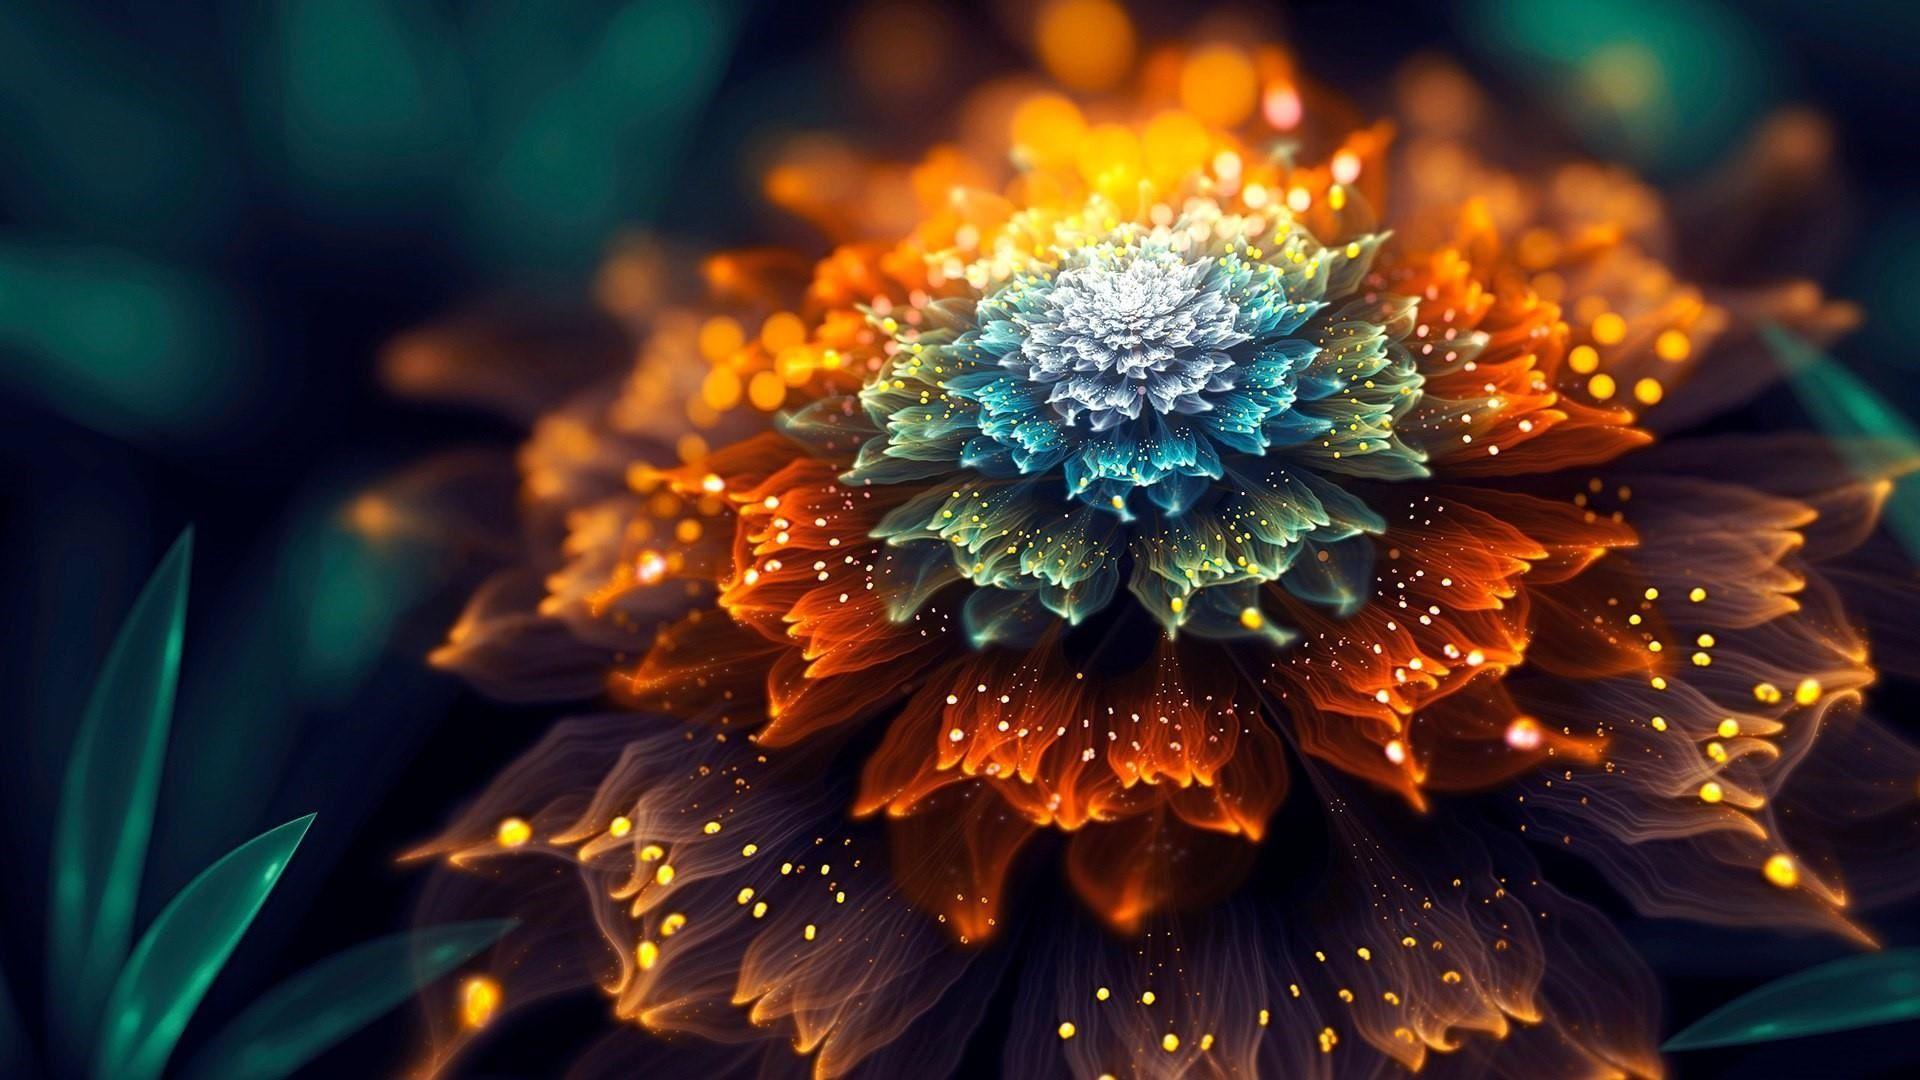 Fractal Flower 1920x1080 wallpaper